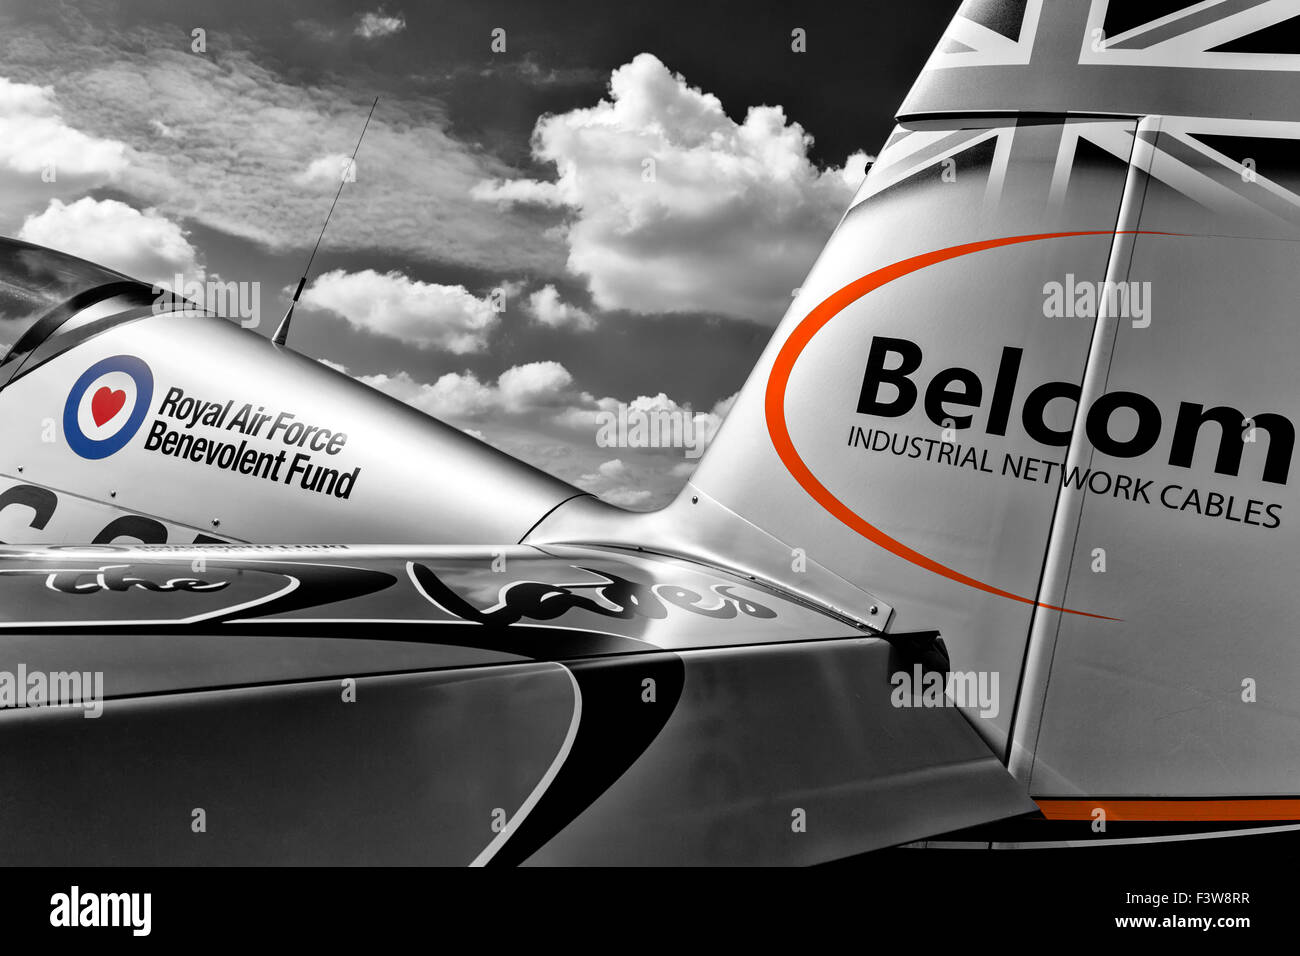 The Blades aerobatic team - Blade One - Extra Flugzeugbau E300 - Stock Image